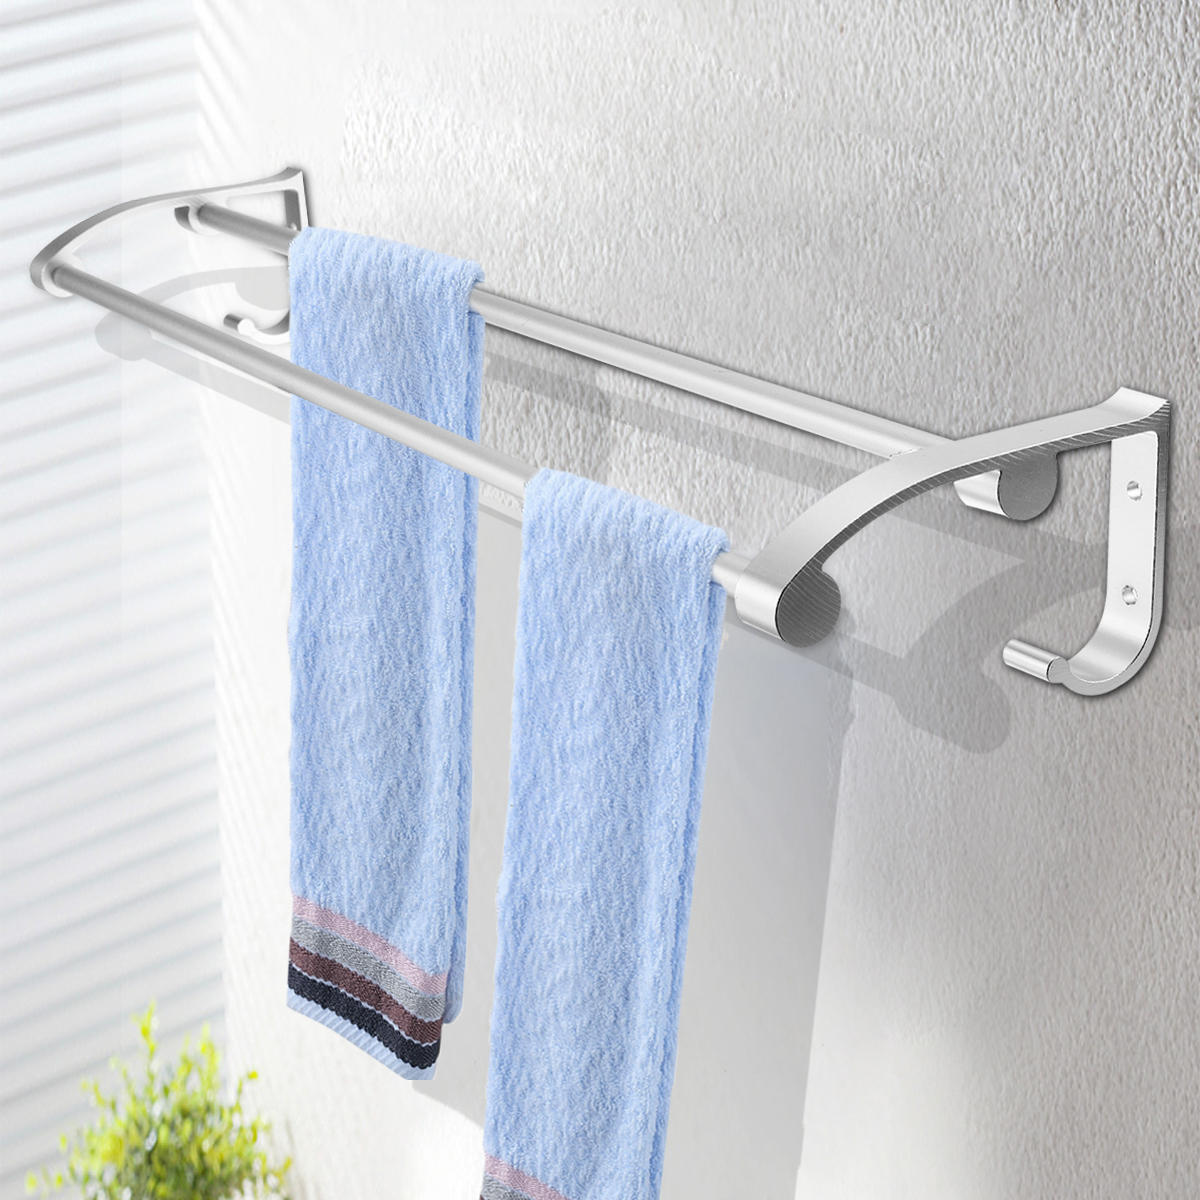 Double Towel Rail Holder Wall Mounted Bathroom Rack Shelf Stainless Steel NEW